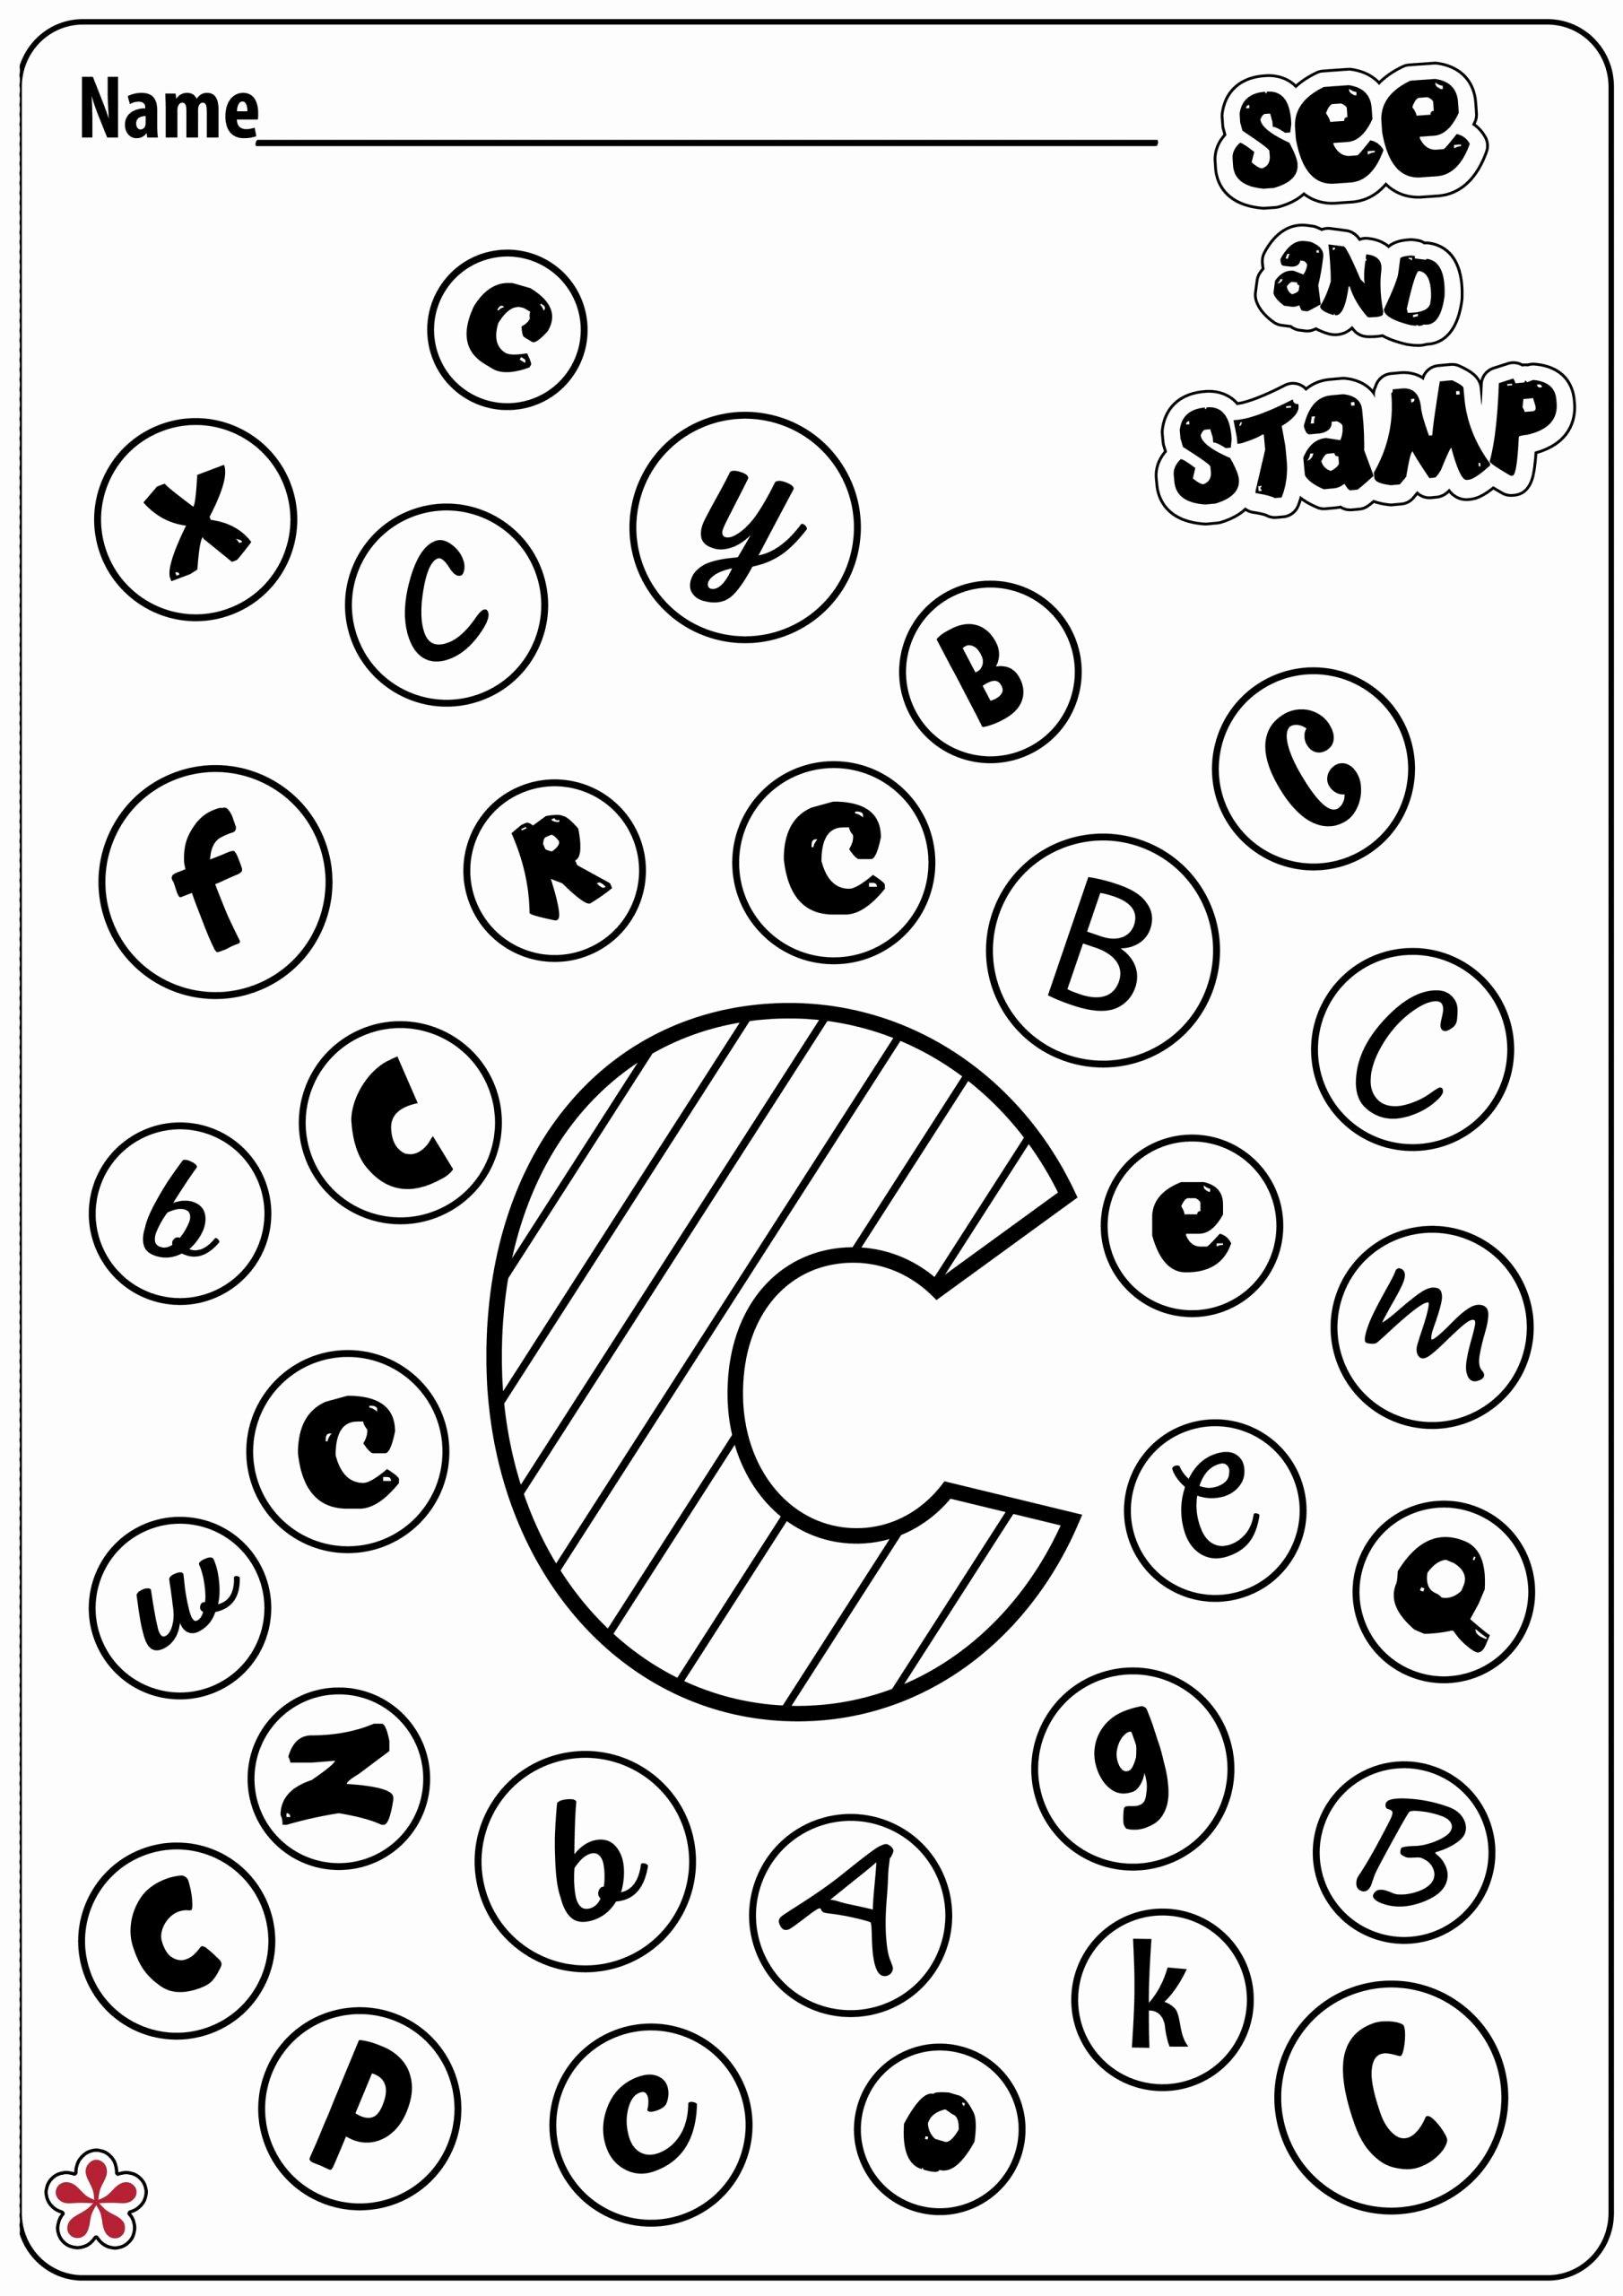 hight resolution of Montessori Worksheets for Preschoolers top Worksheets Math Worksheet  Kindergarten Worksheets – Printable Worksheets for Kids